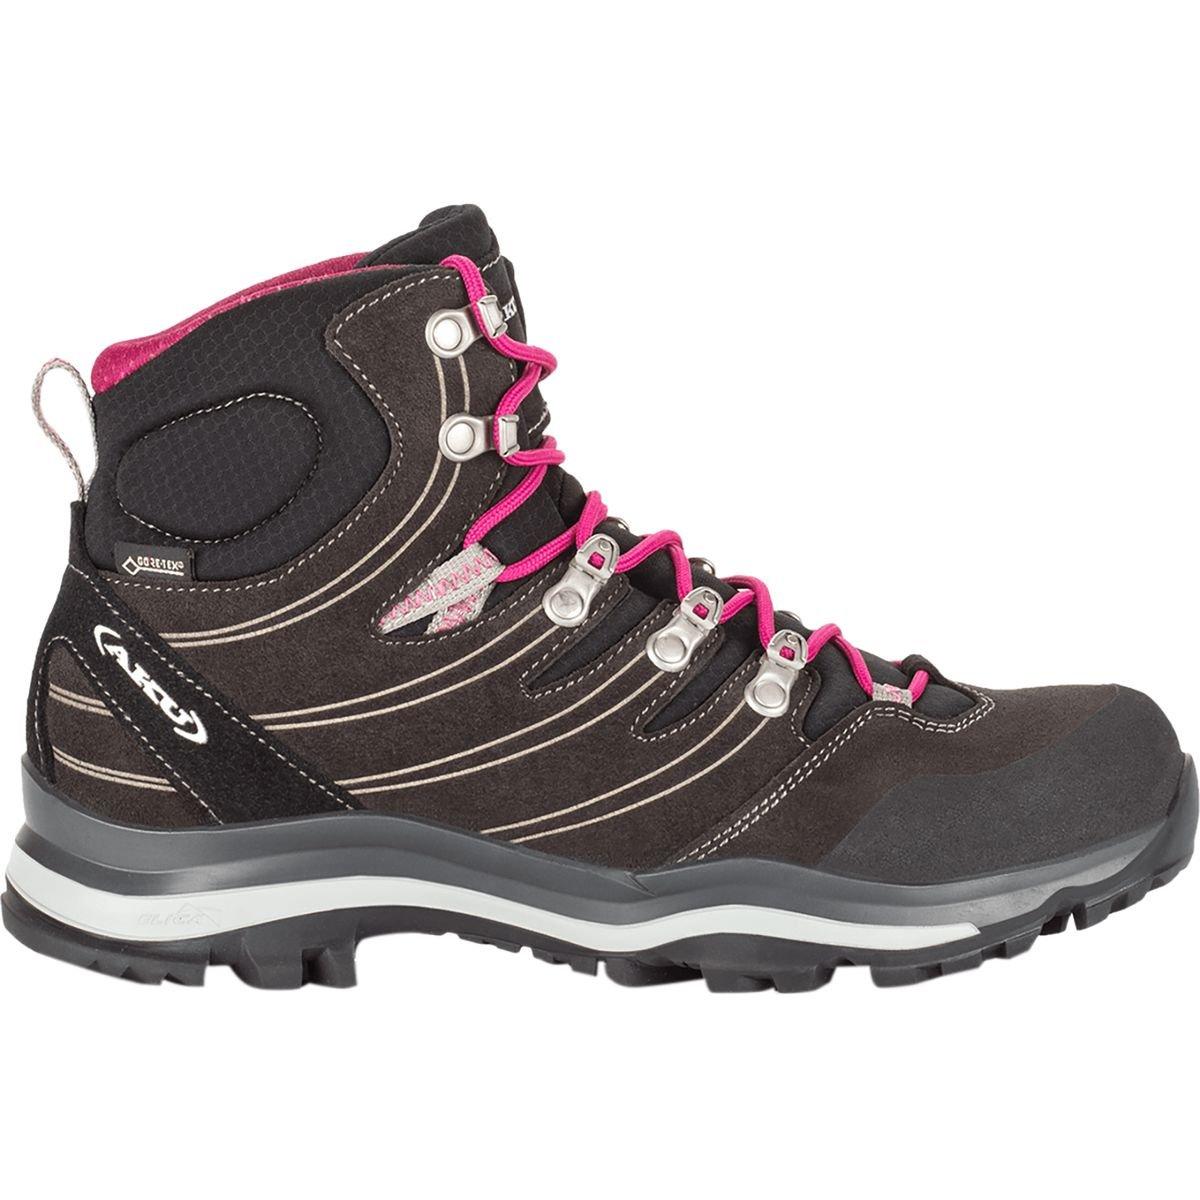 AKU Alterra GTX Boot - Women's B073XVCQTF 7.5 B(M) US|Anthracite/Magenta